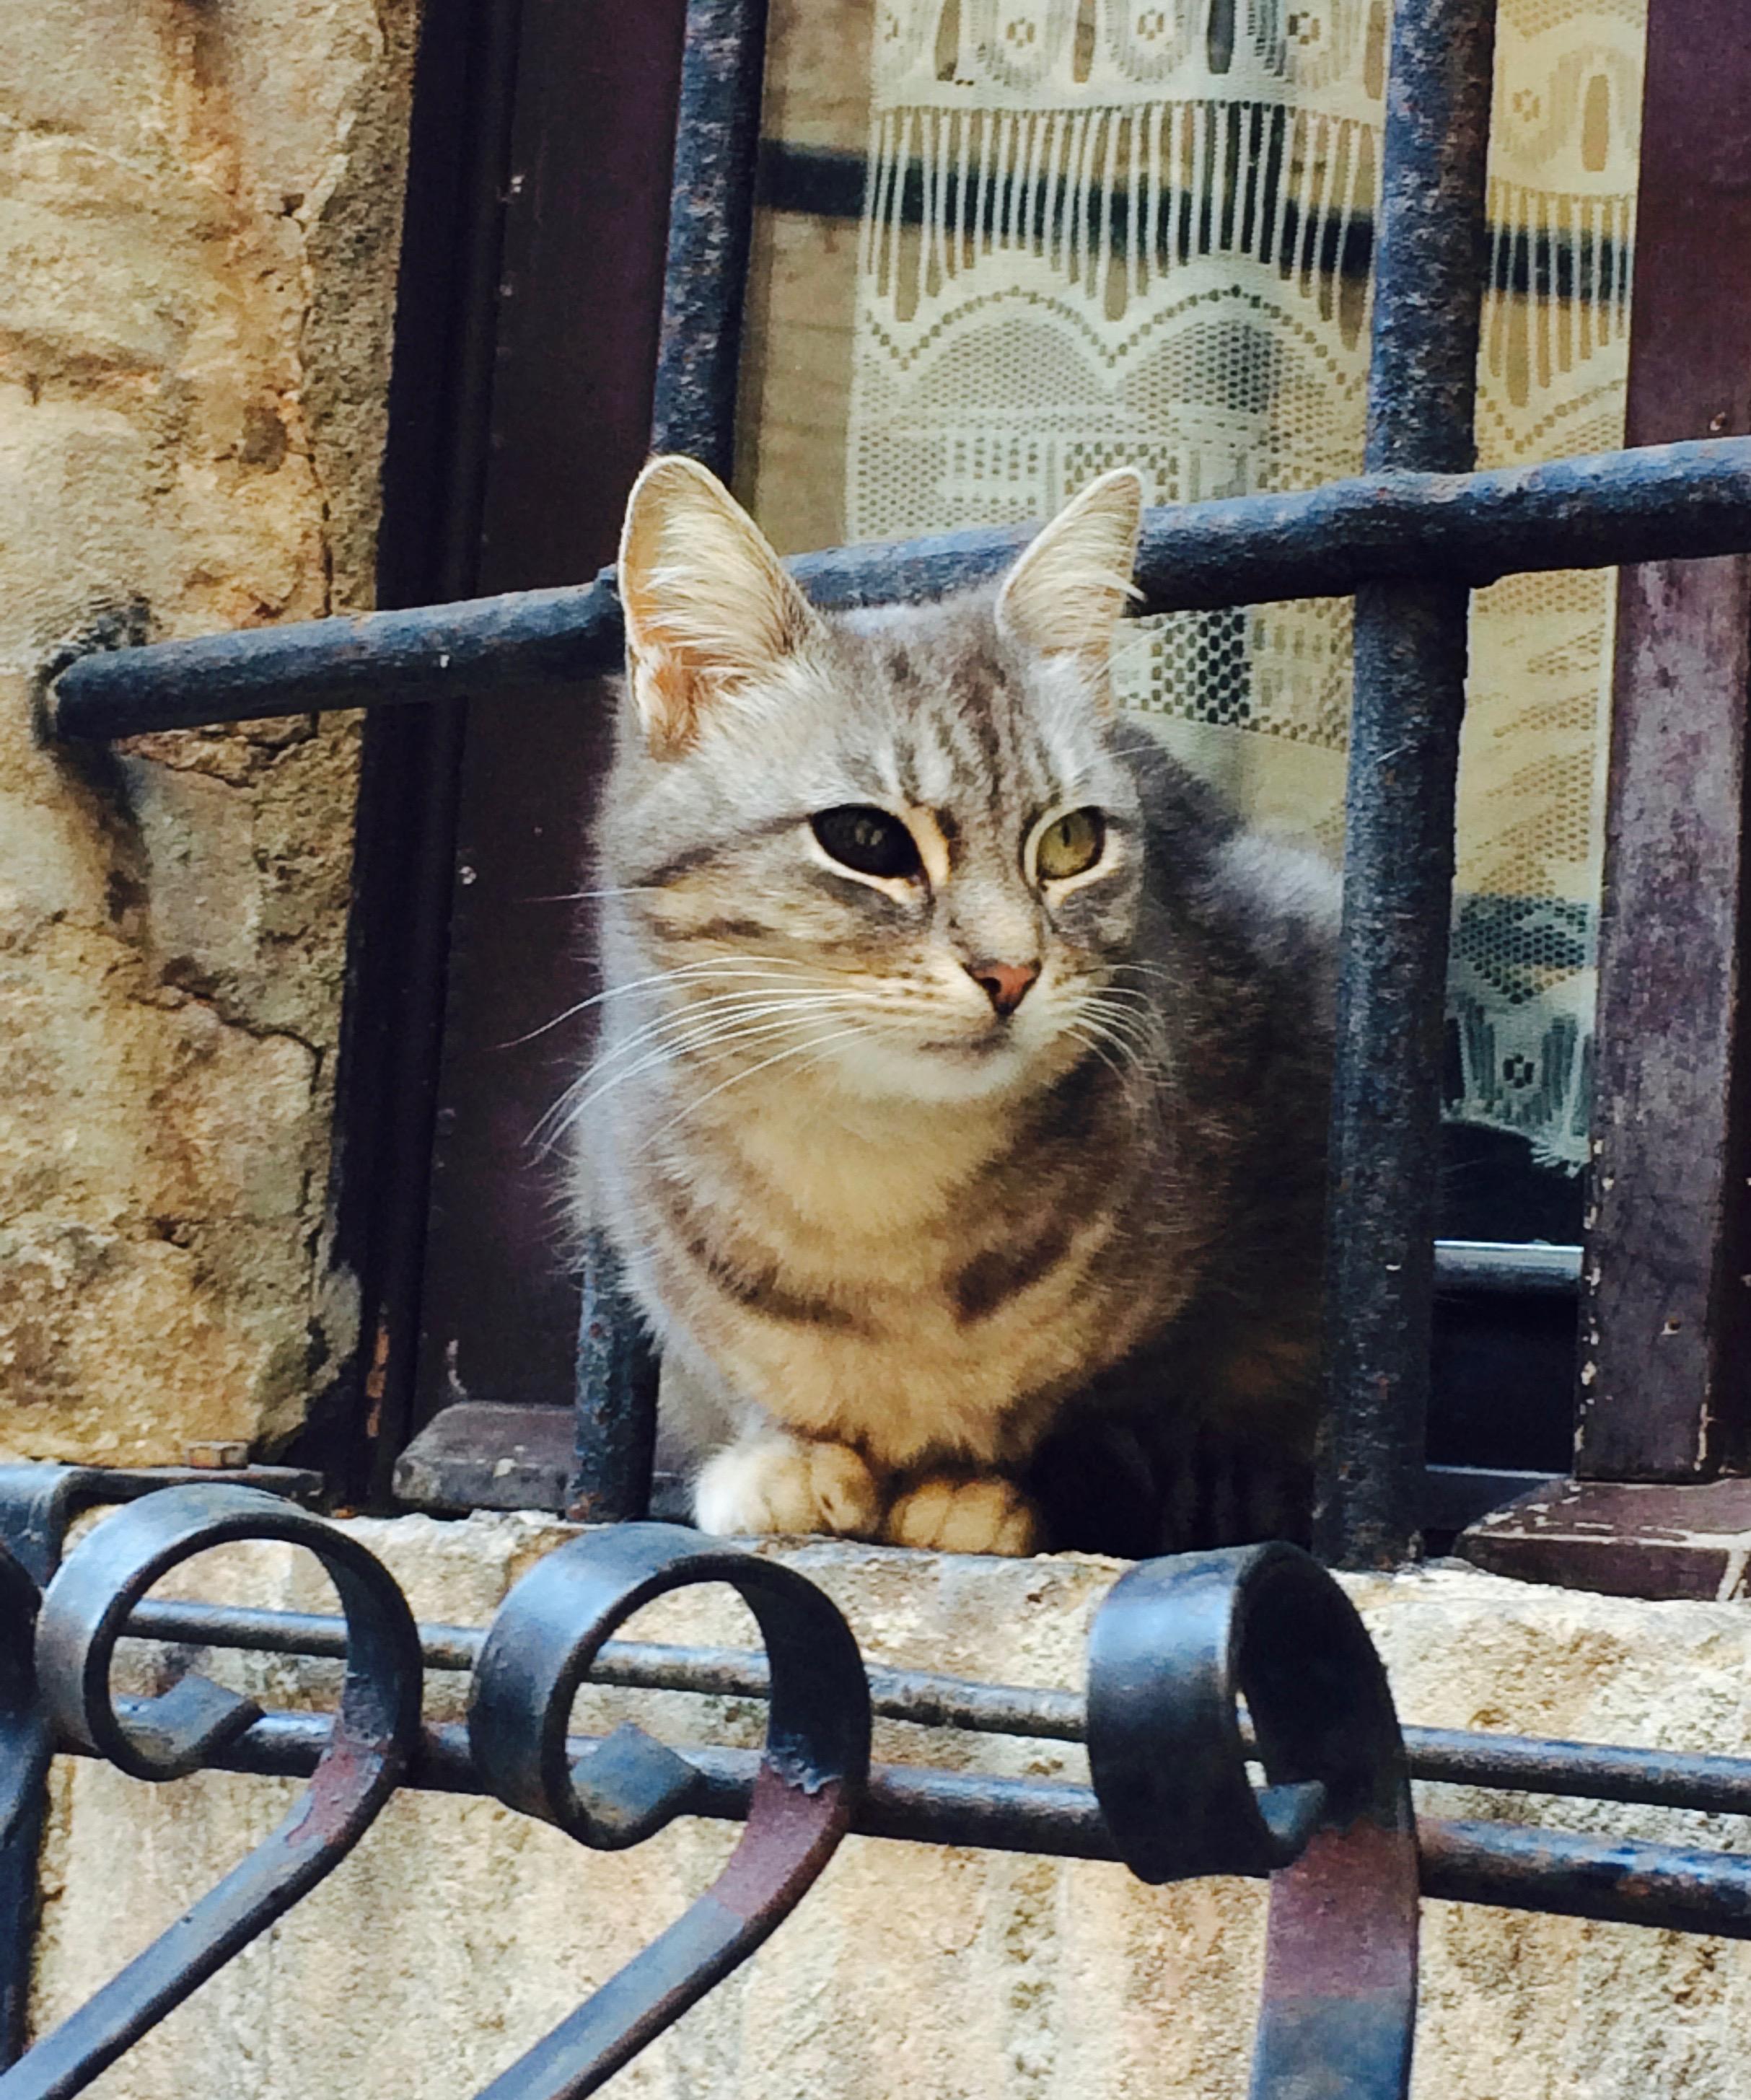 spello_cat3.jpg